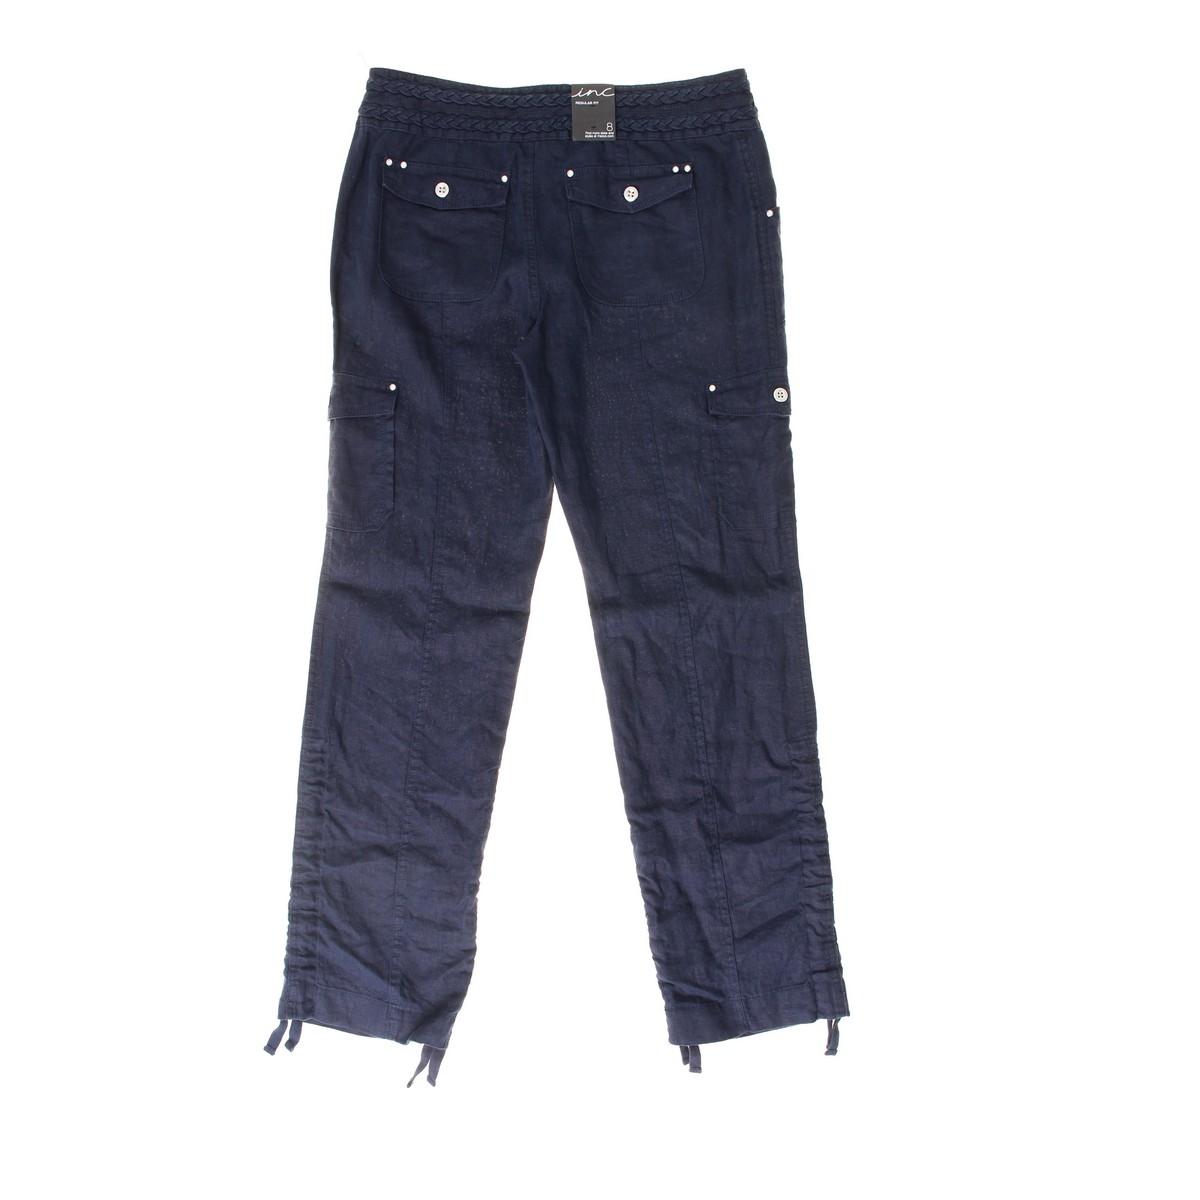 Lastest 28 Beautiful Navy Cargo Pants Womens U2013 Playzoa.com